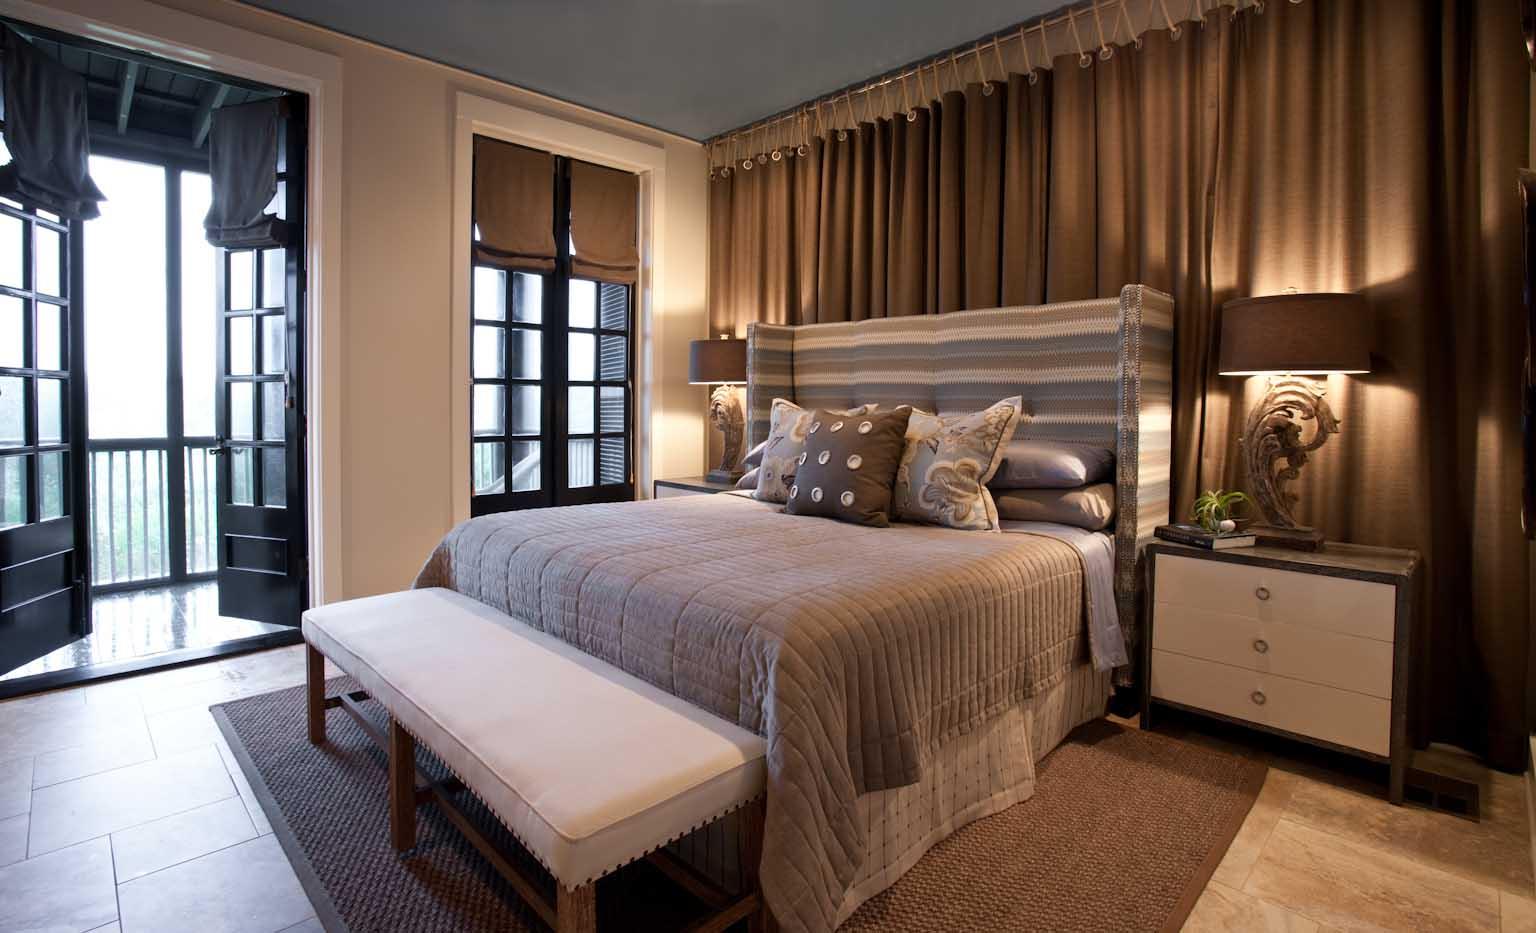 century upholstery atlanta ga 30360 angies list. Black Bedroom Furniture Sets. Home Design Ideas